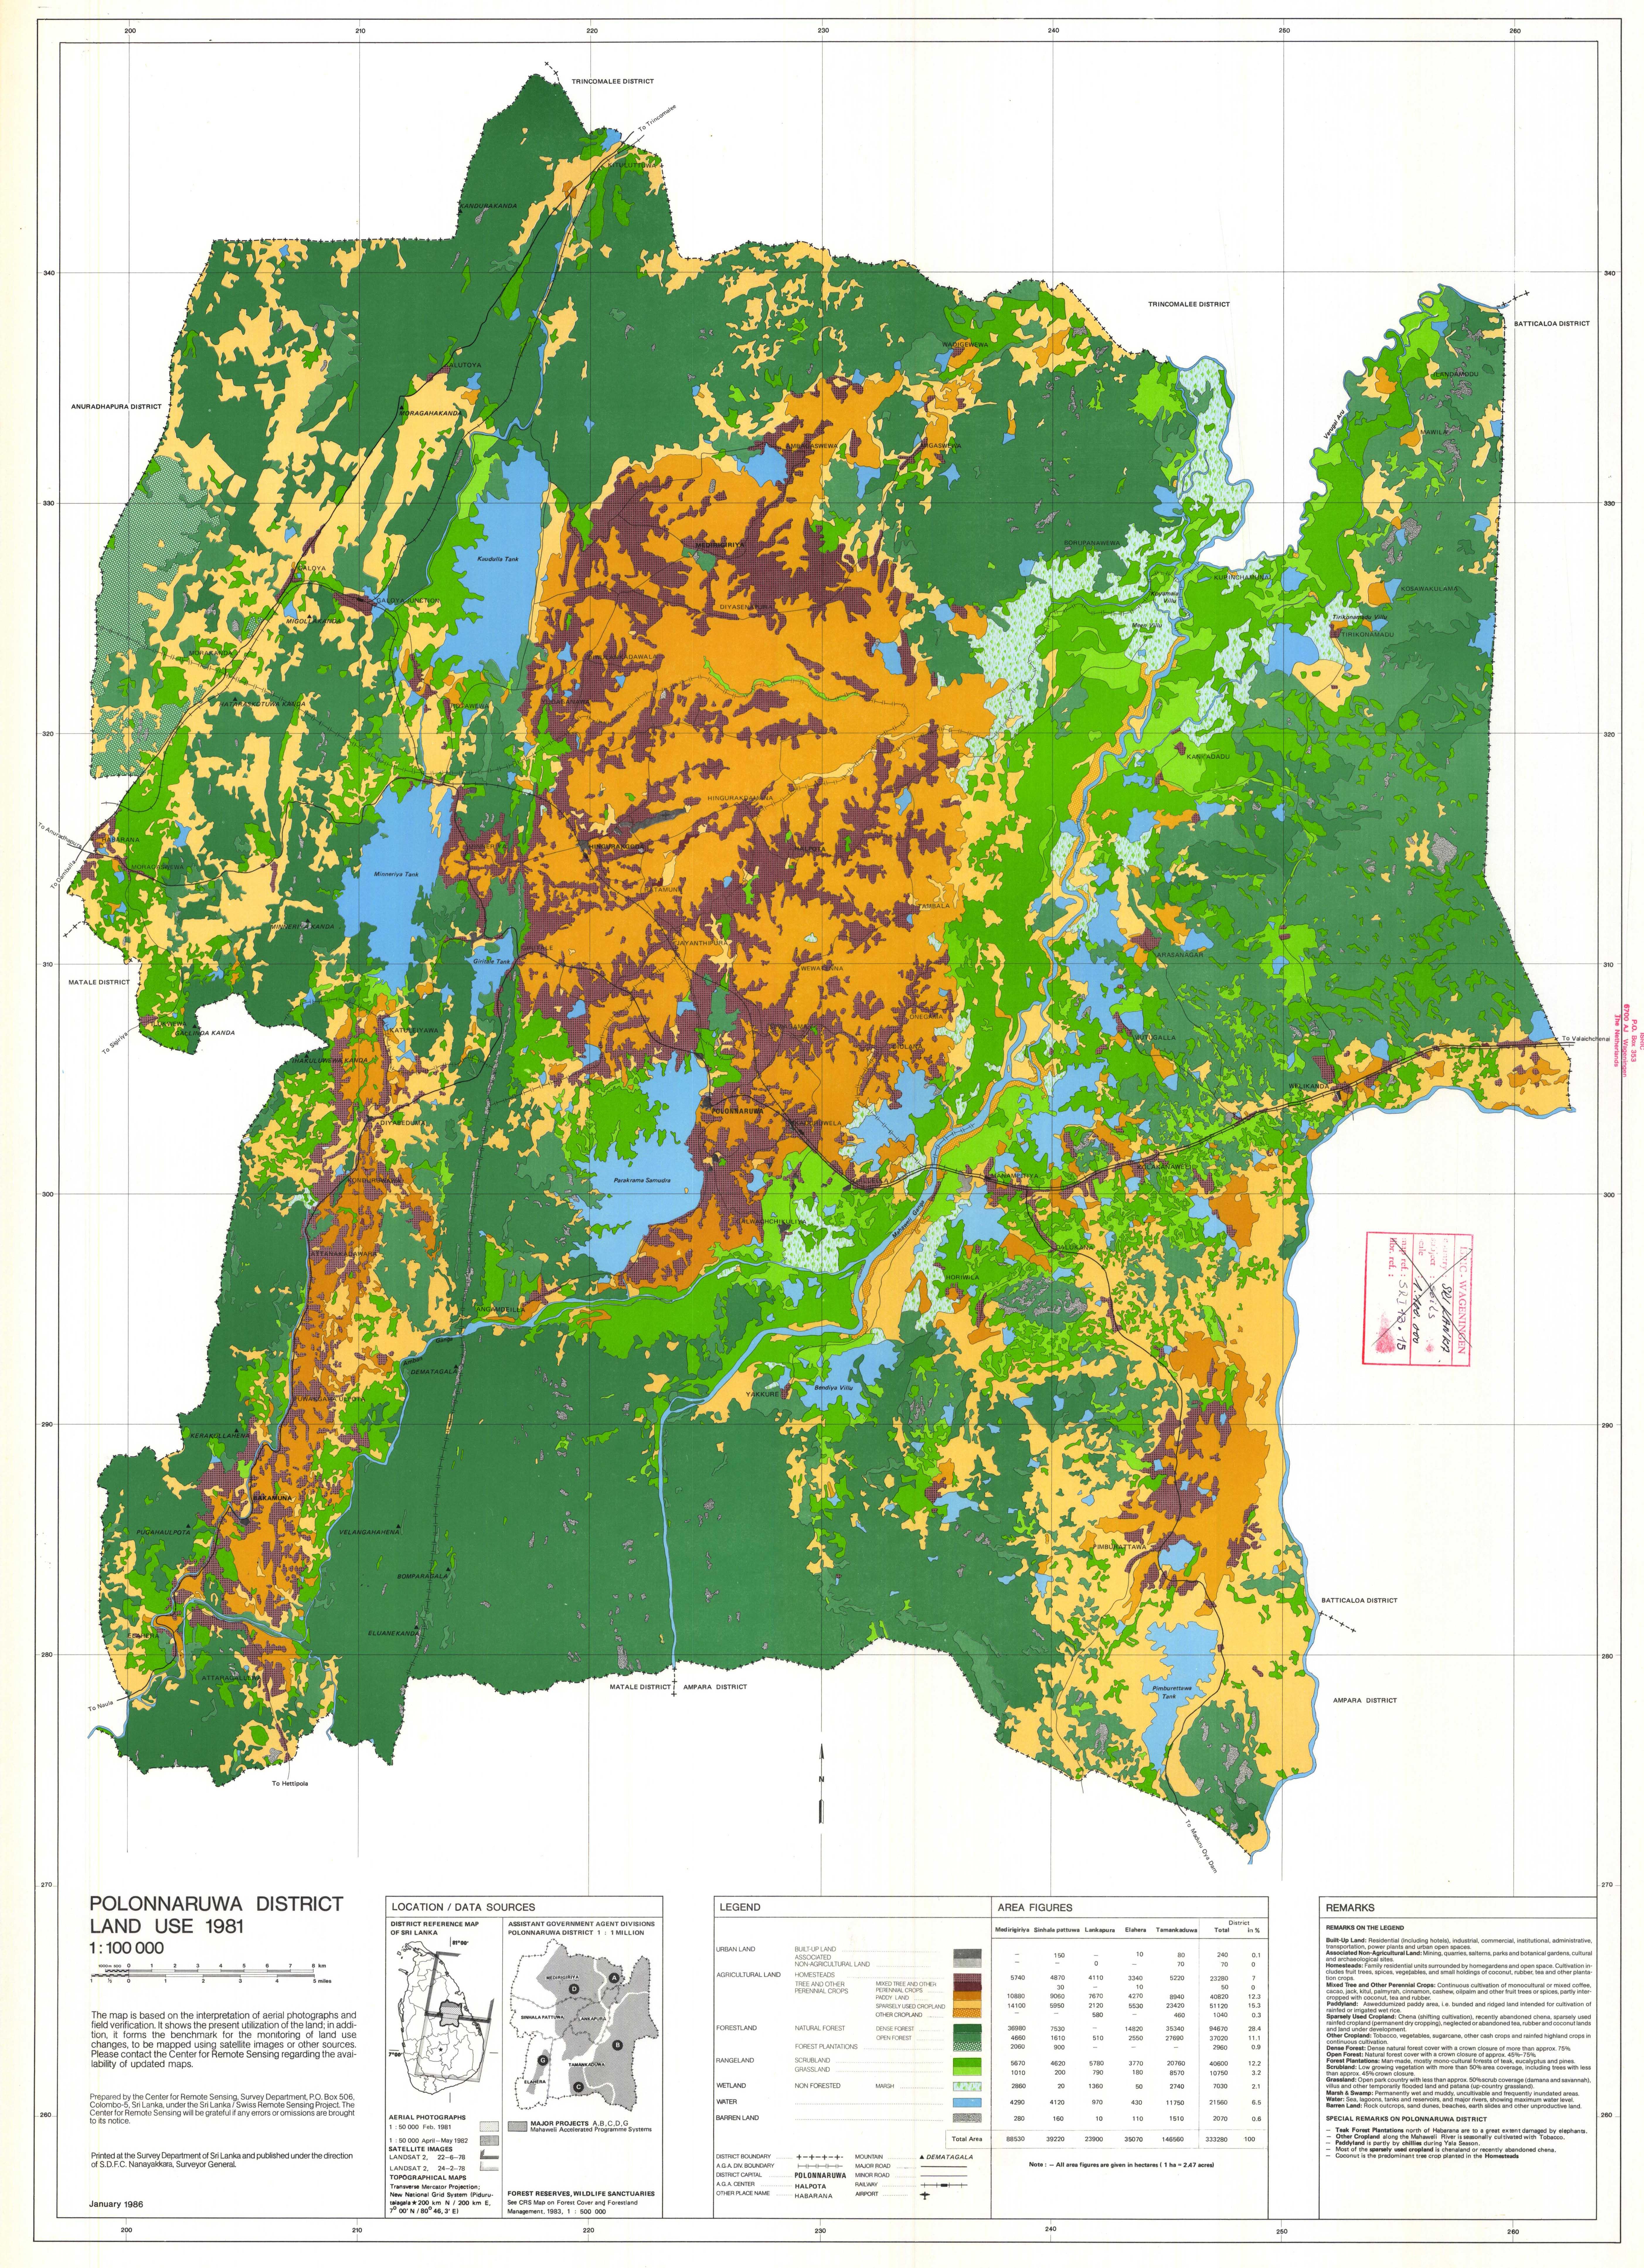 Land use - ESDAC - European Commission